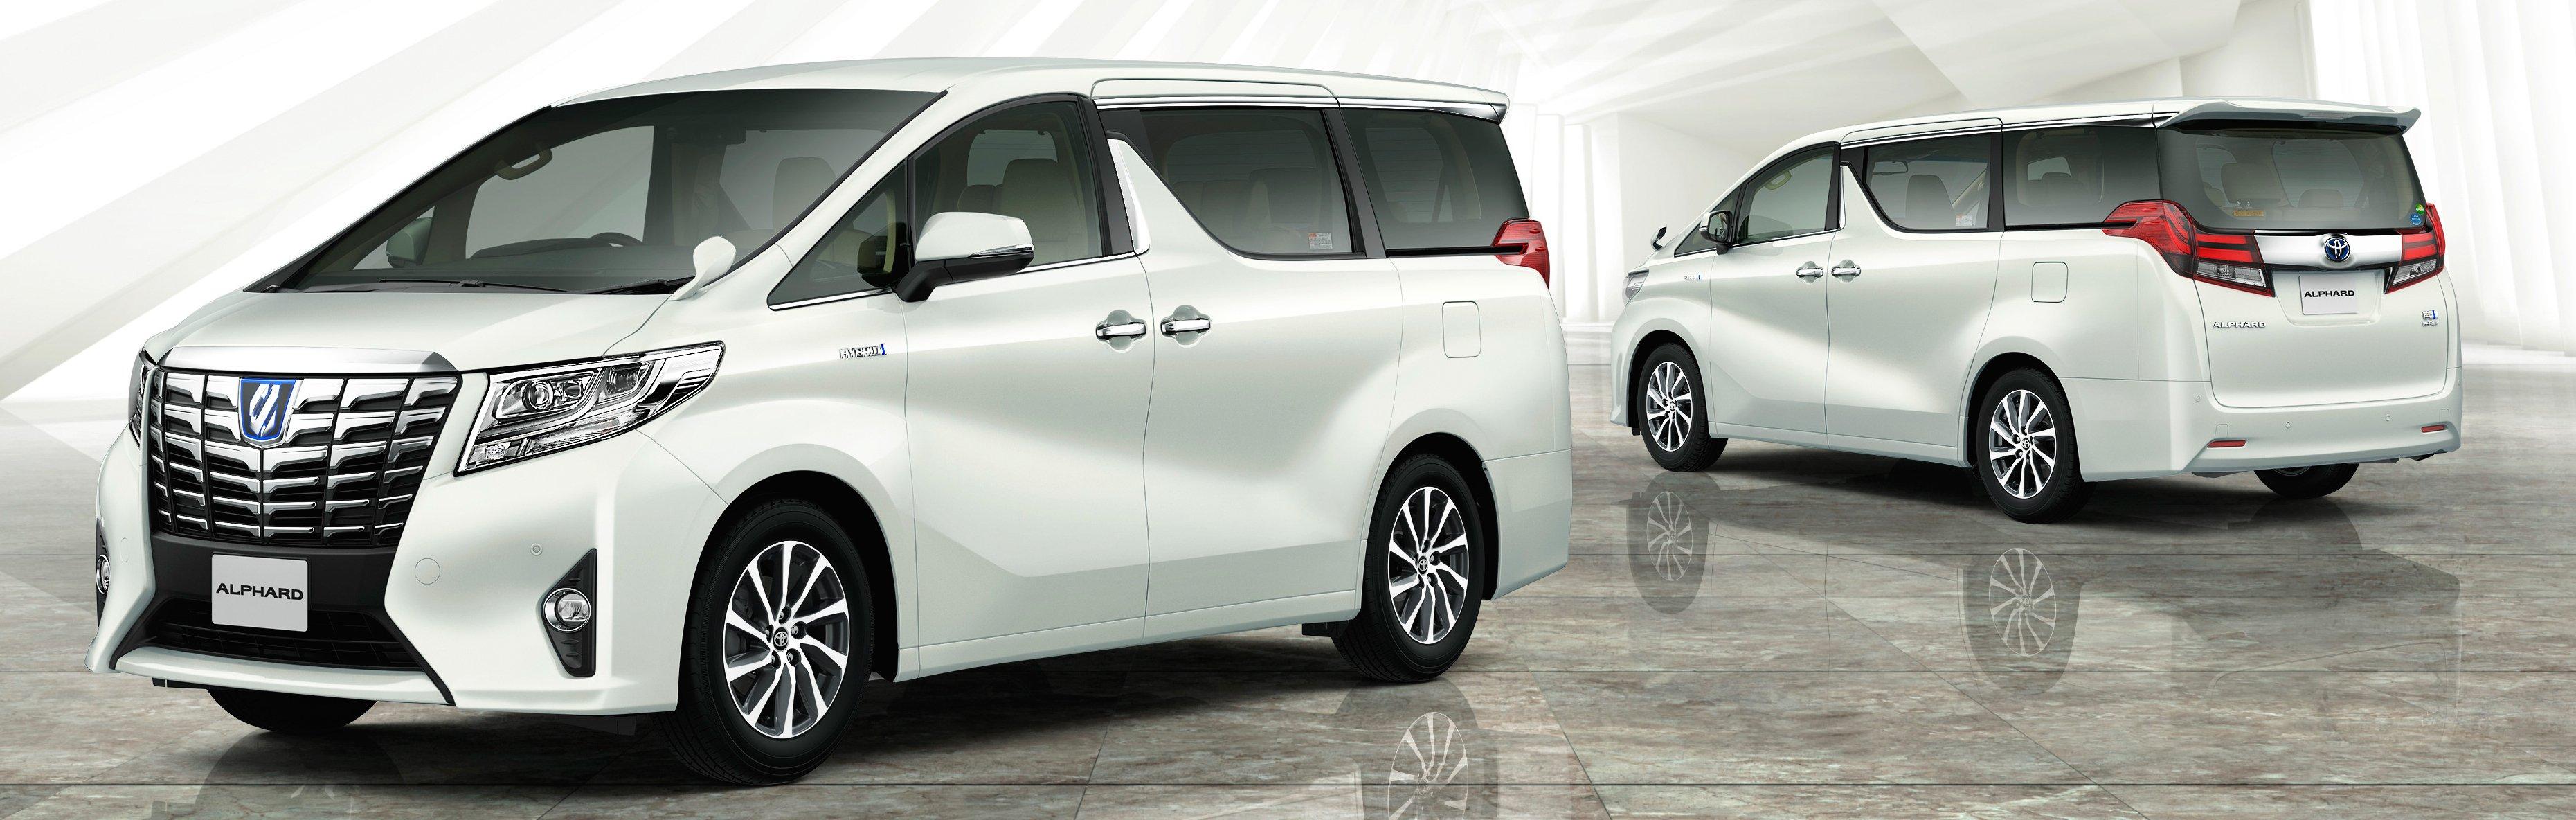 تواجدها! 2015-Toyota-Alphard_004-Alphard-G-F-Package-copy.jpg